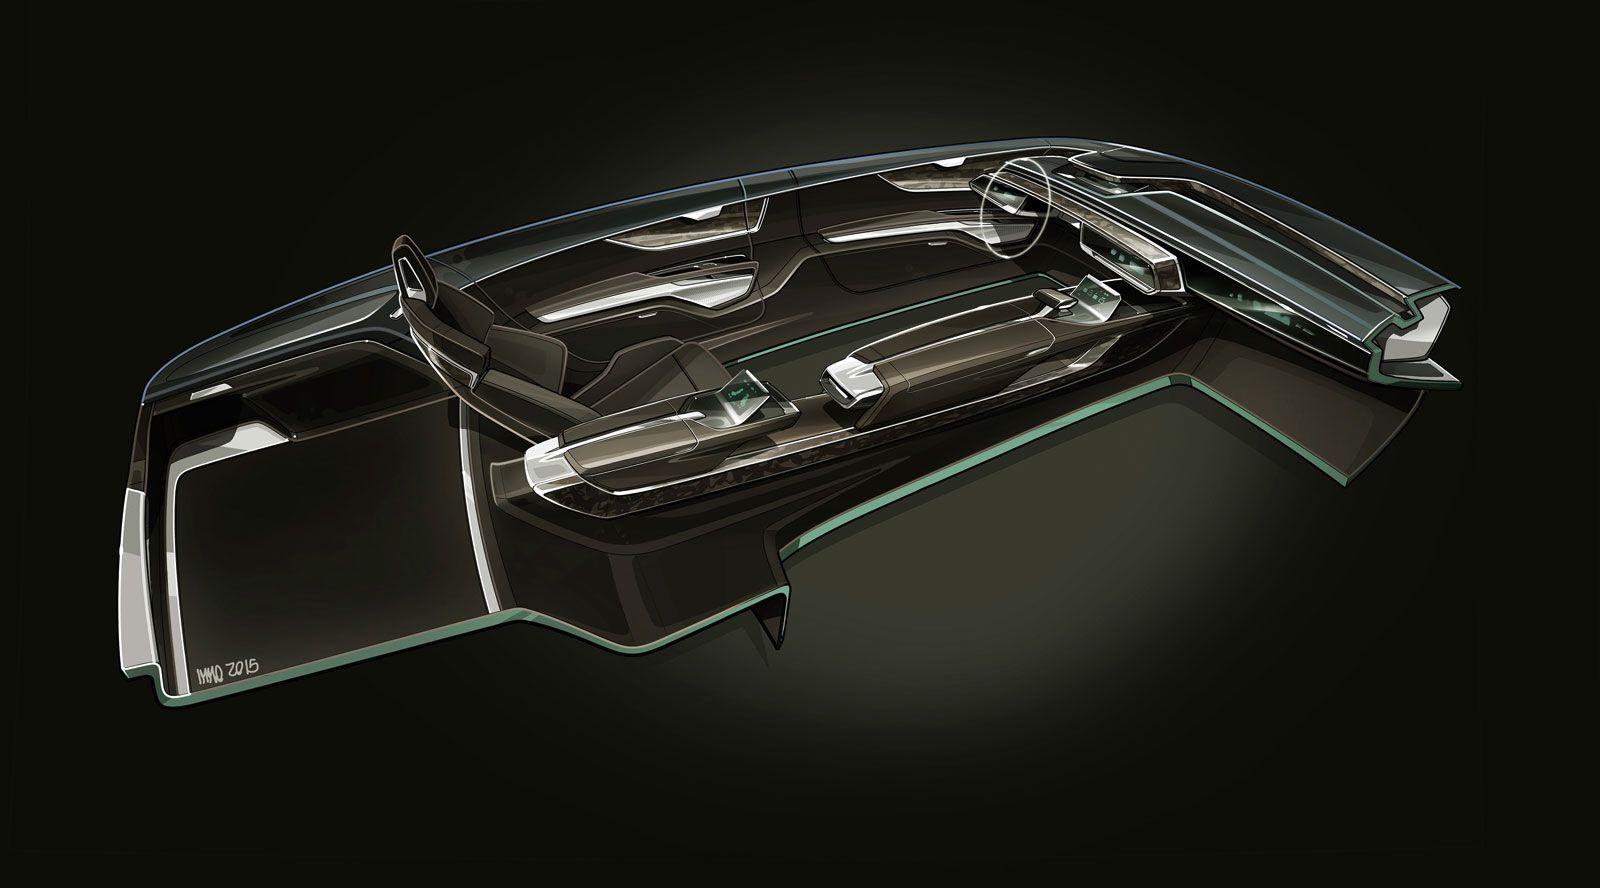 Audi-Prologue-allroad-Concept-Interior-Design-Sketch-Render-01.jpg (1600×888)